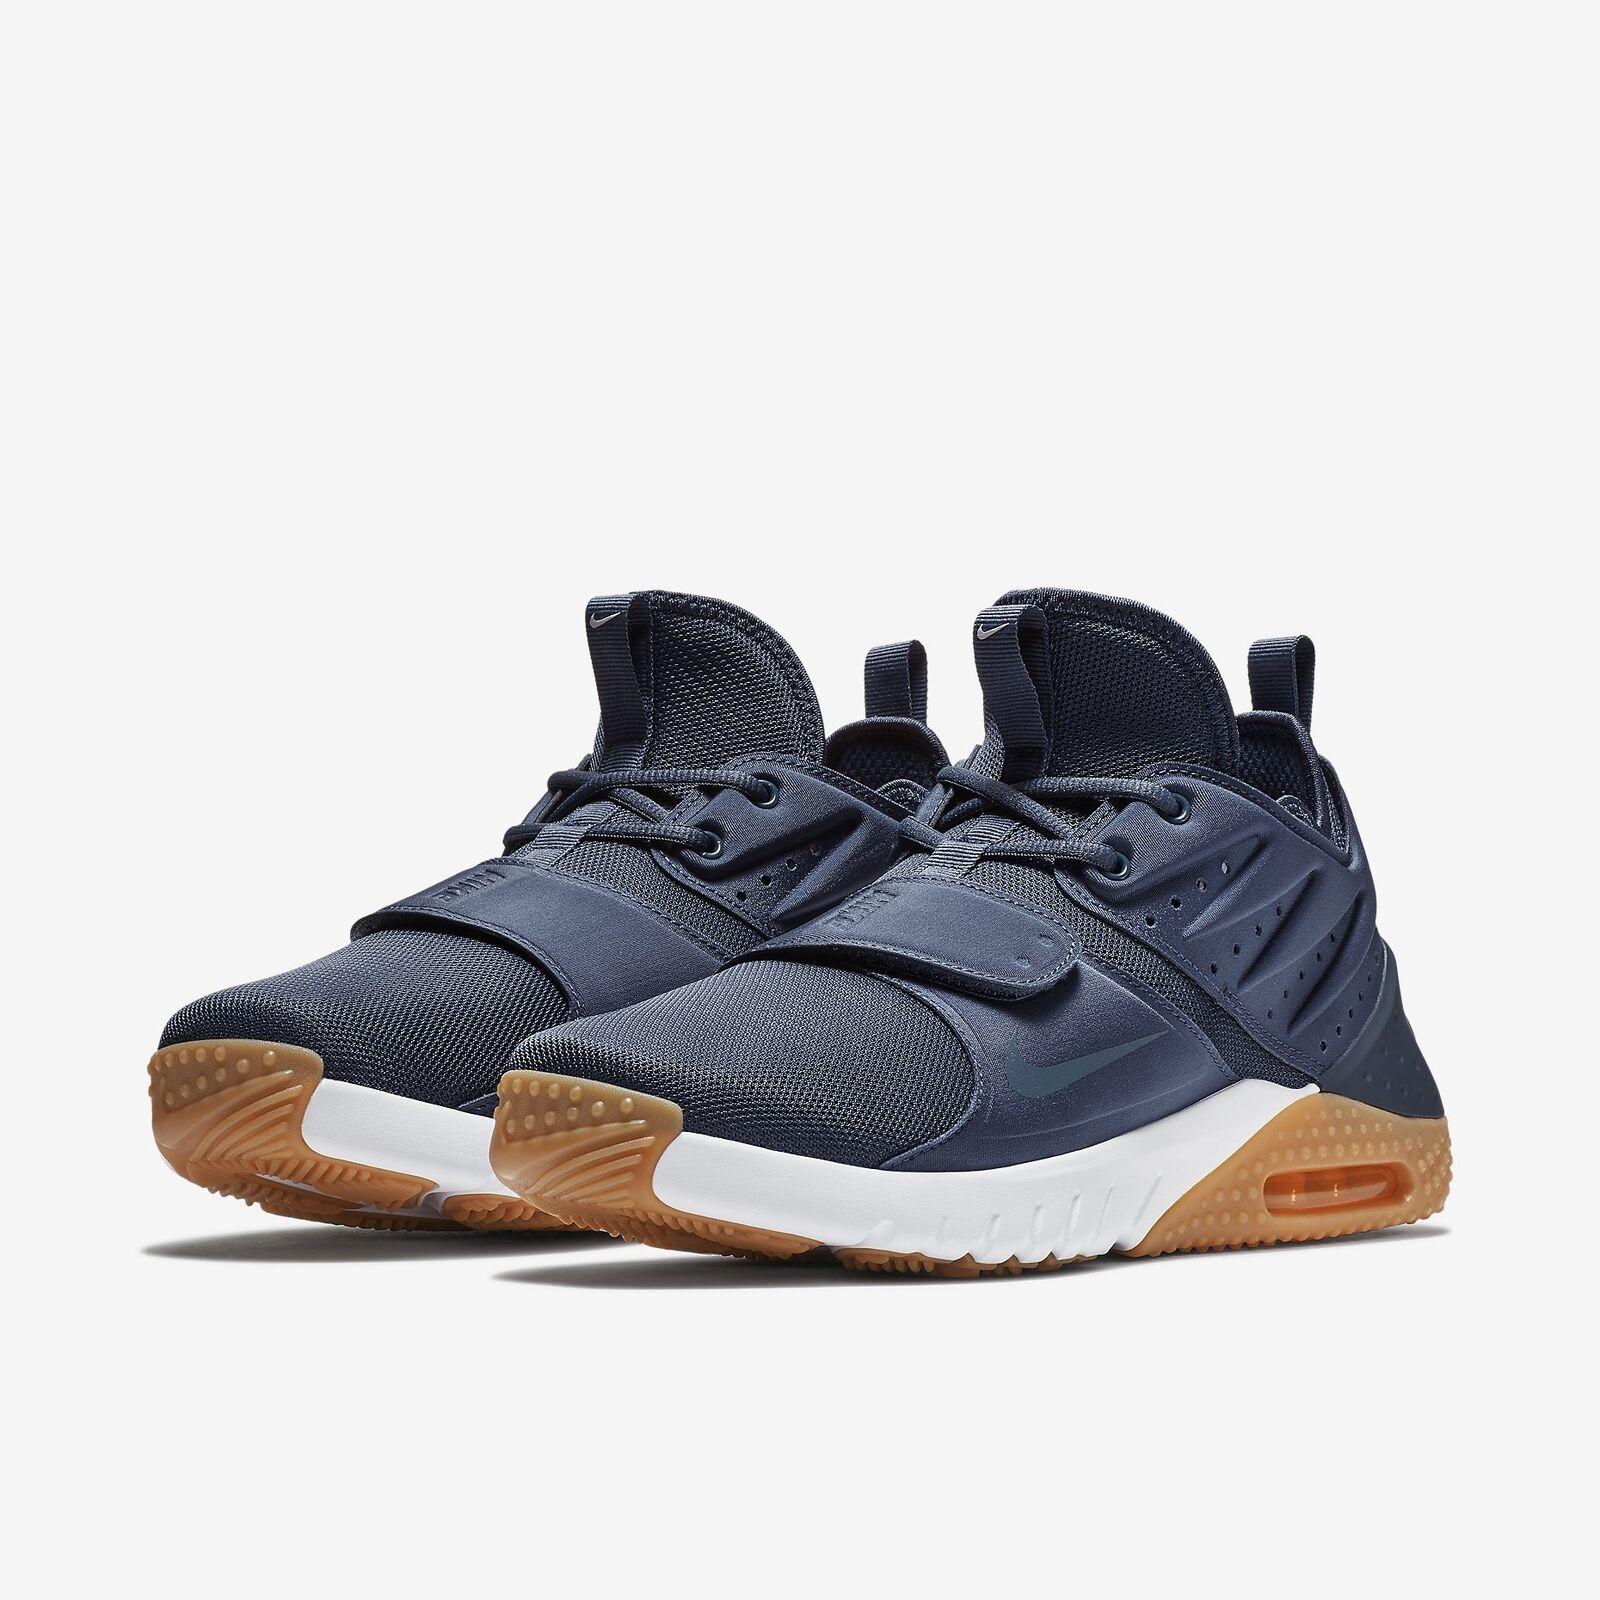 Nike Air Max Trainer 1 Obsidian Blue Gum Retro Cross Training Mens All NEW